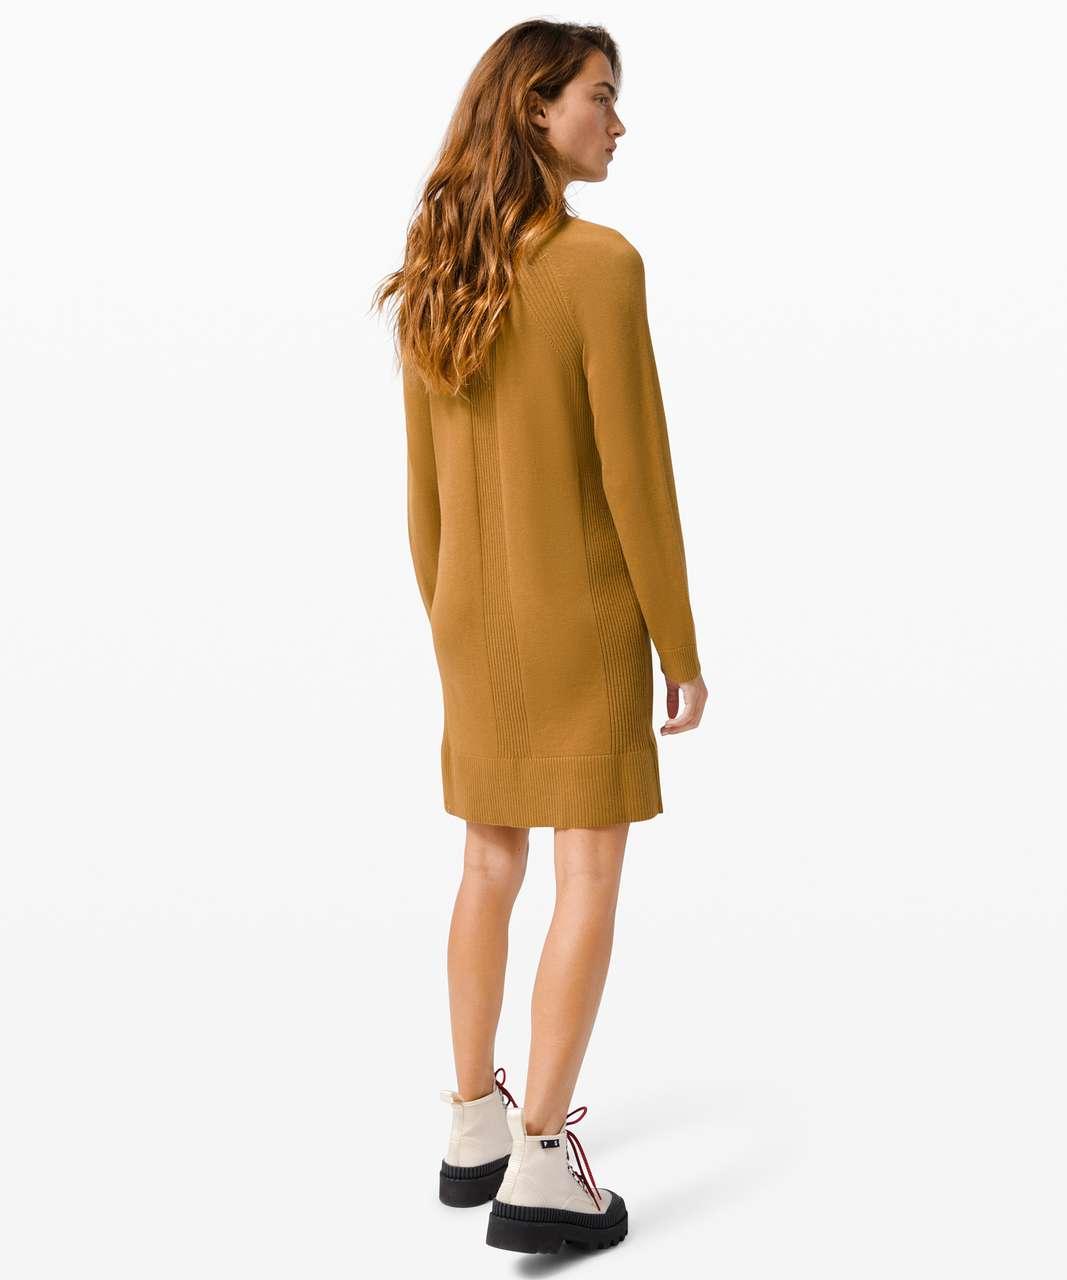 Lululemon Keep it Cozy Dress - Spiced Bronze